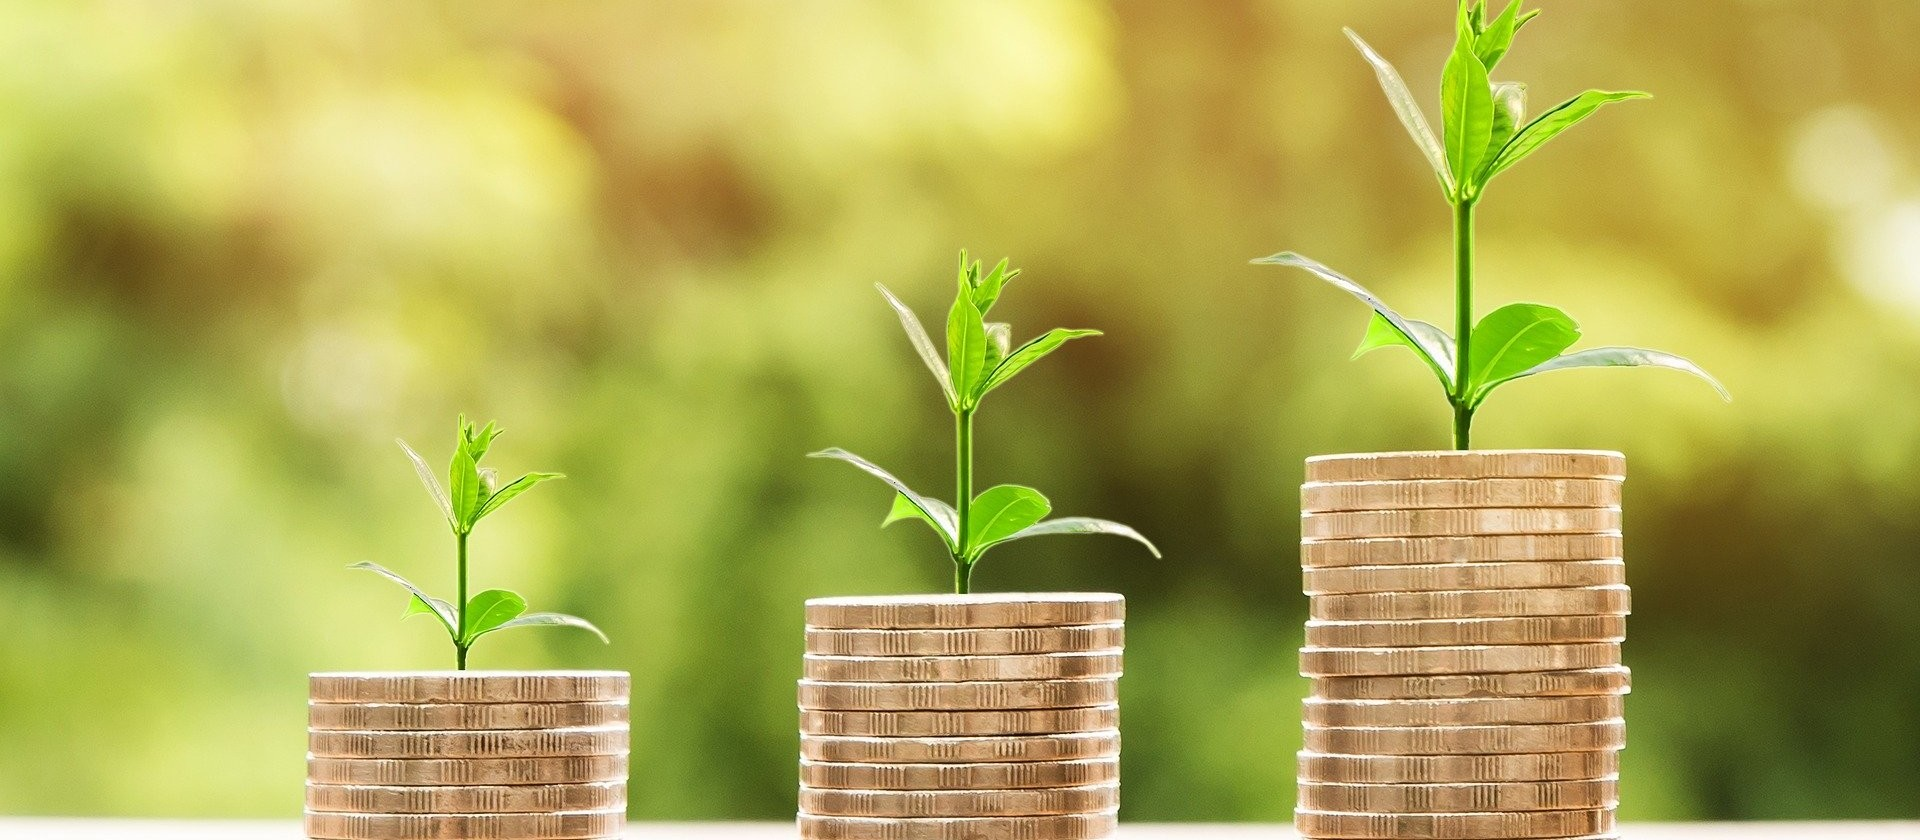 Mercado financeiro e sustentabilidade